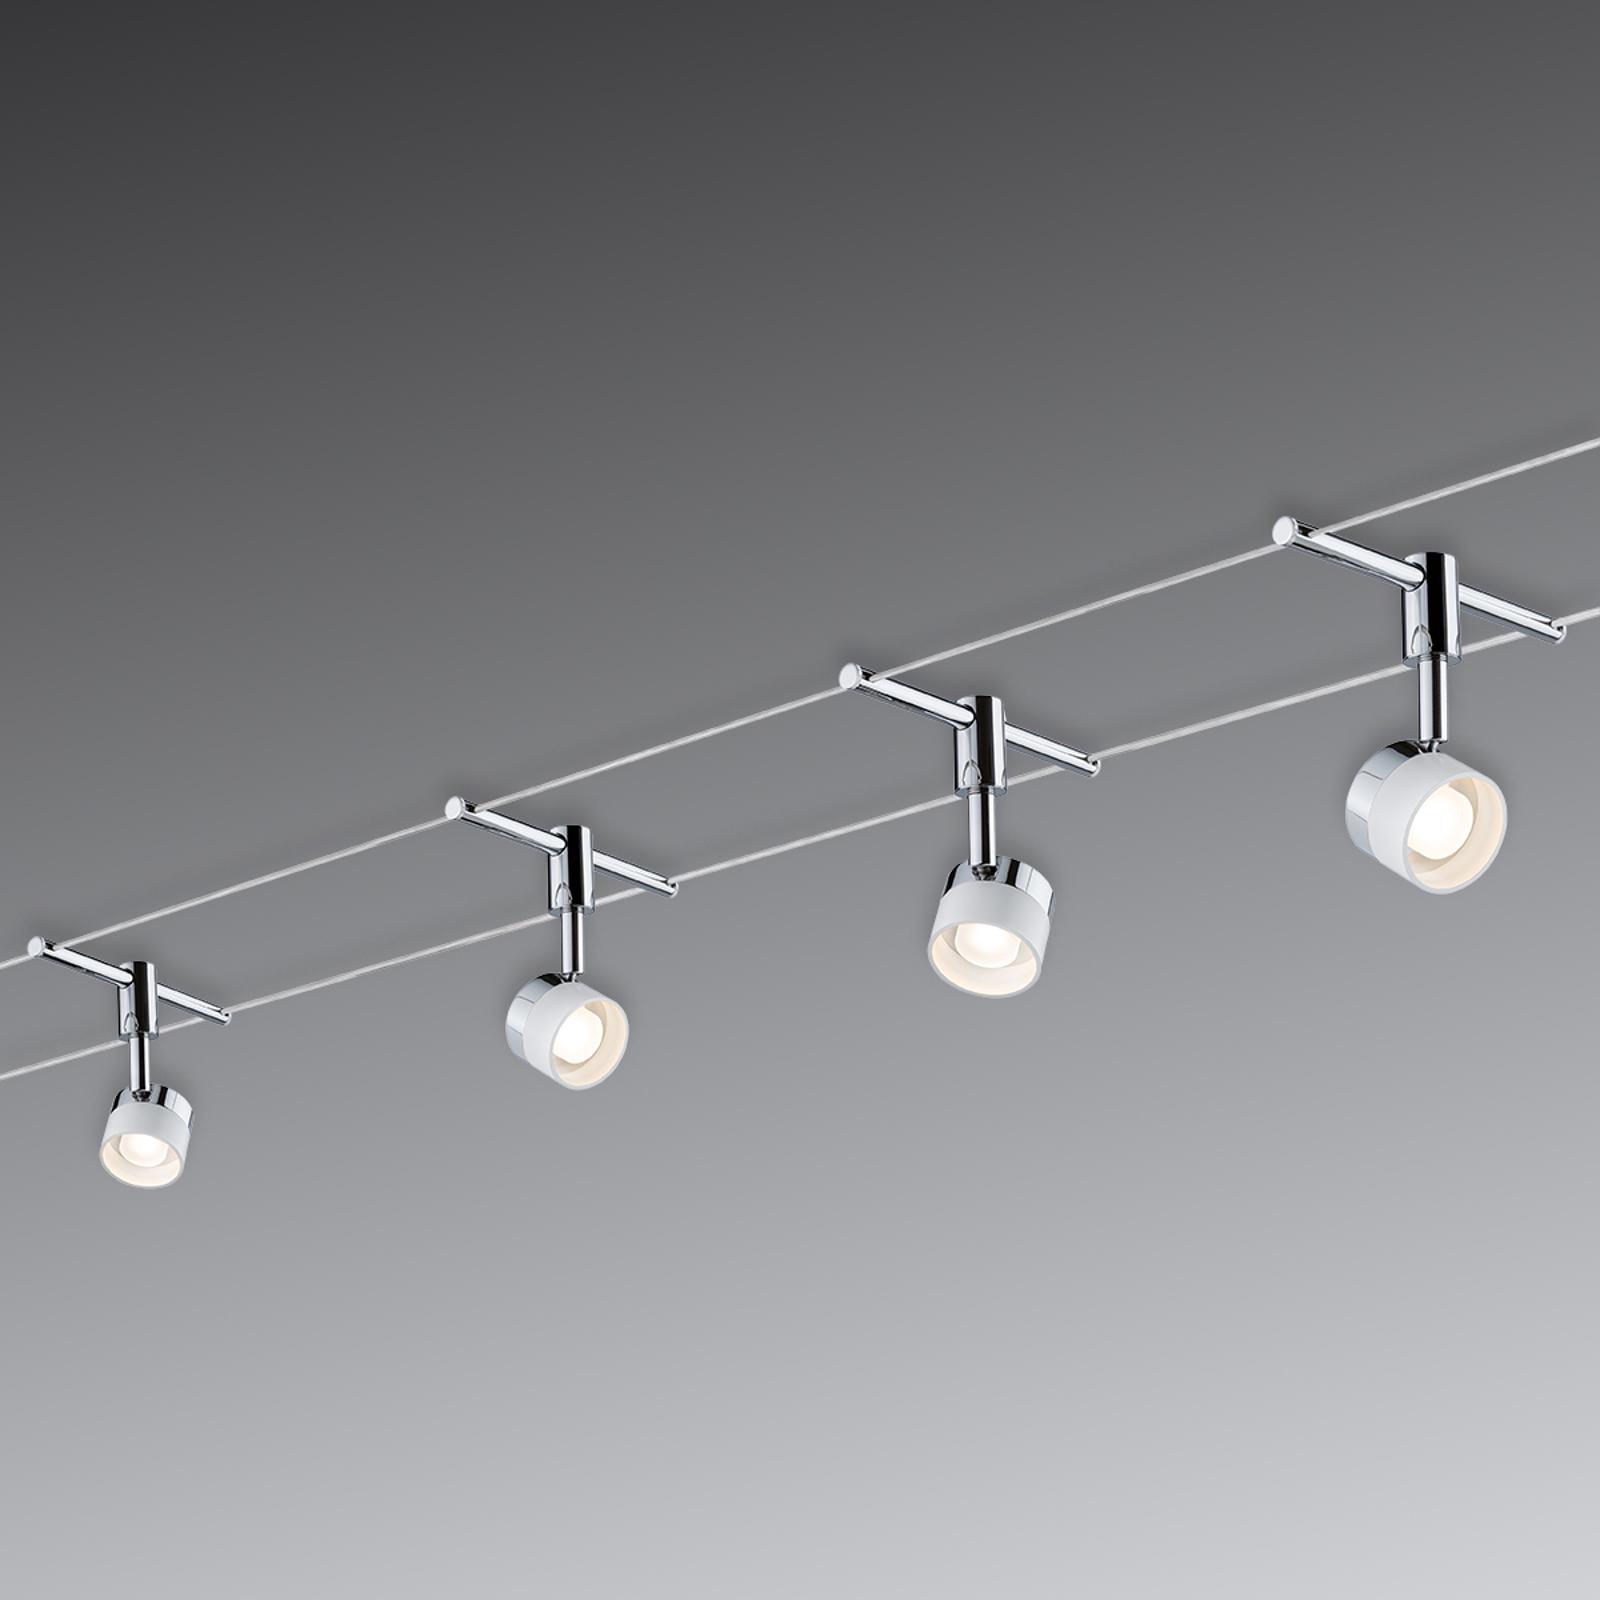 Syst. linkowy LED STAGE z 4 okr. lampkami